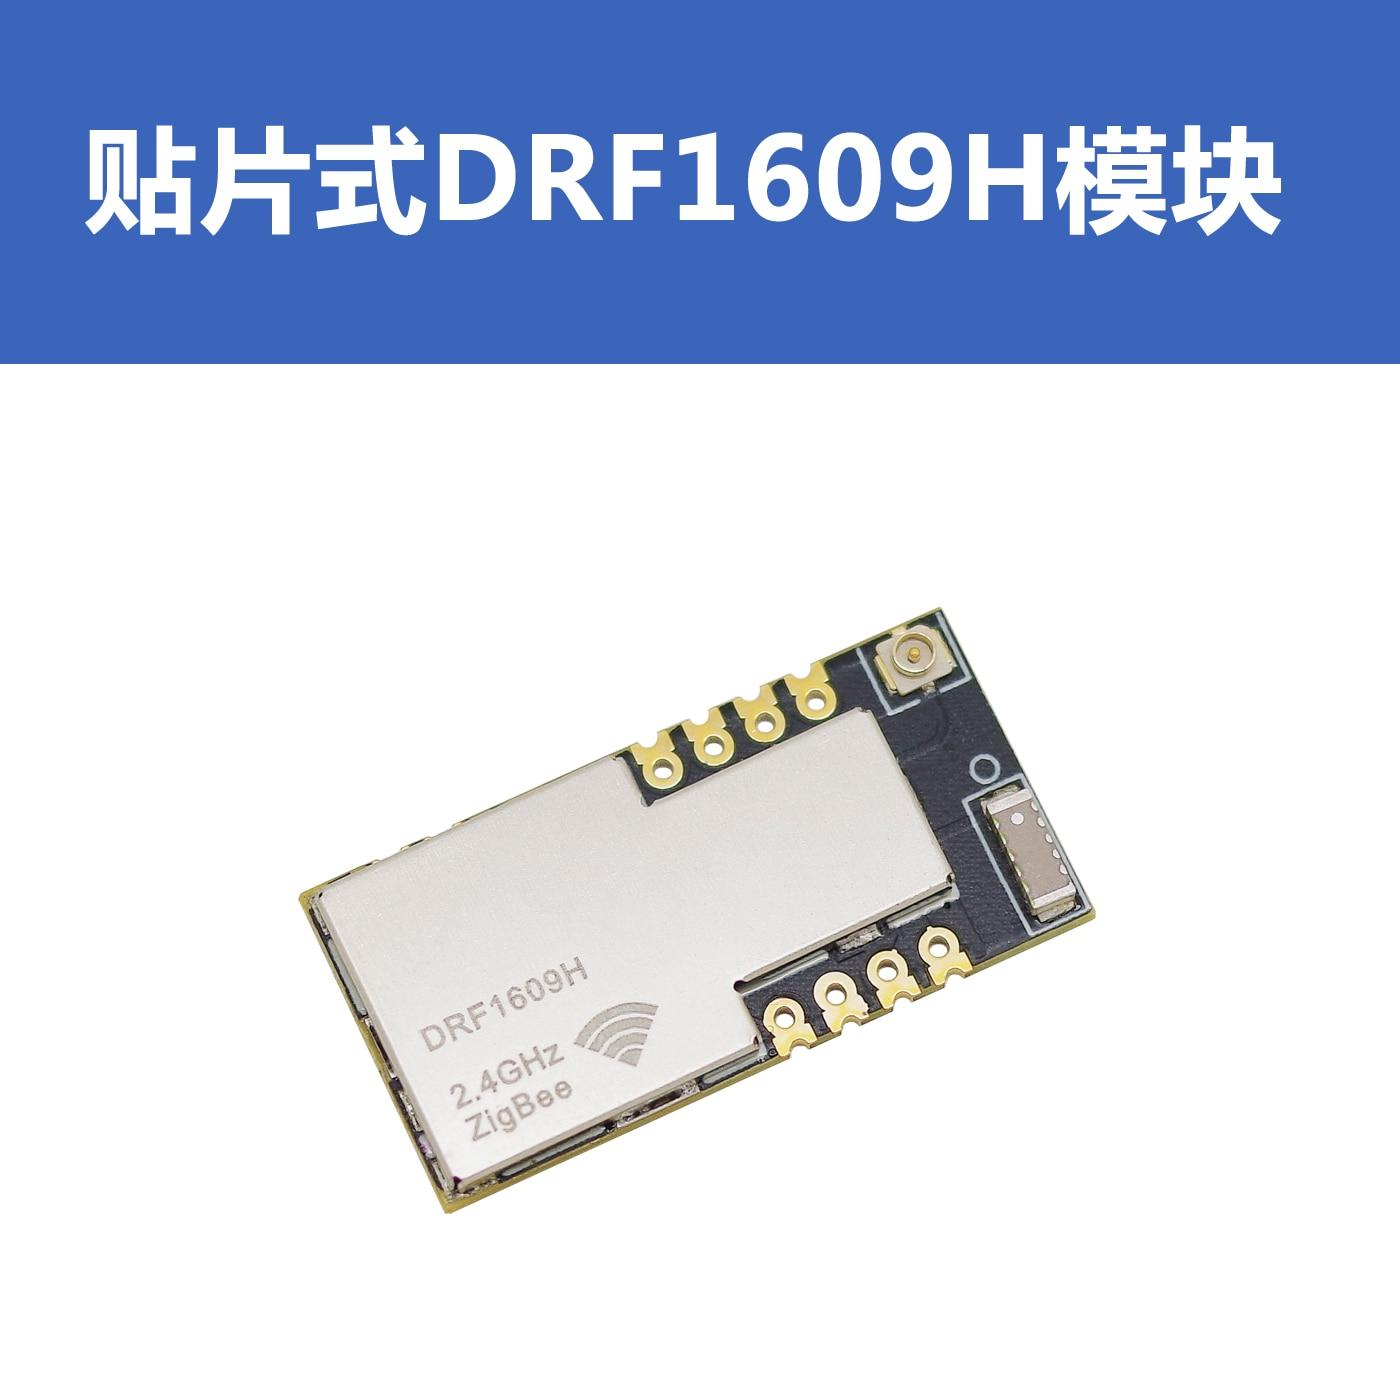 UART serial port to ZigBee wireless module, cc2630 chip, DRF1609H with PA, 1.6km send antenna dmdg v4 etherne to uart serial port wi fi converting module rt5350f communication module antenna